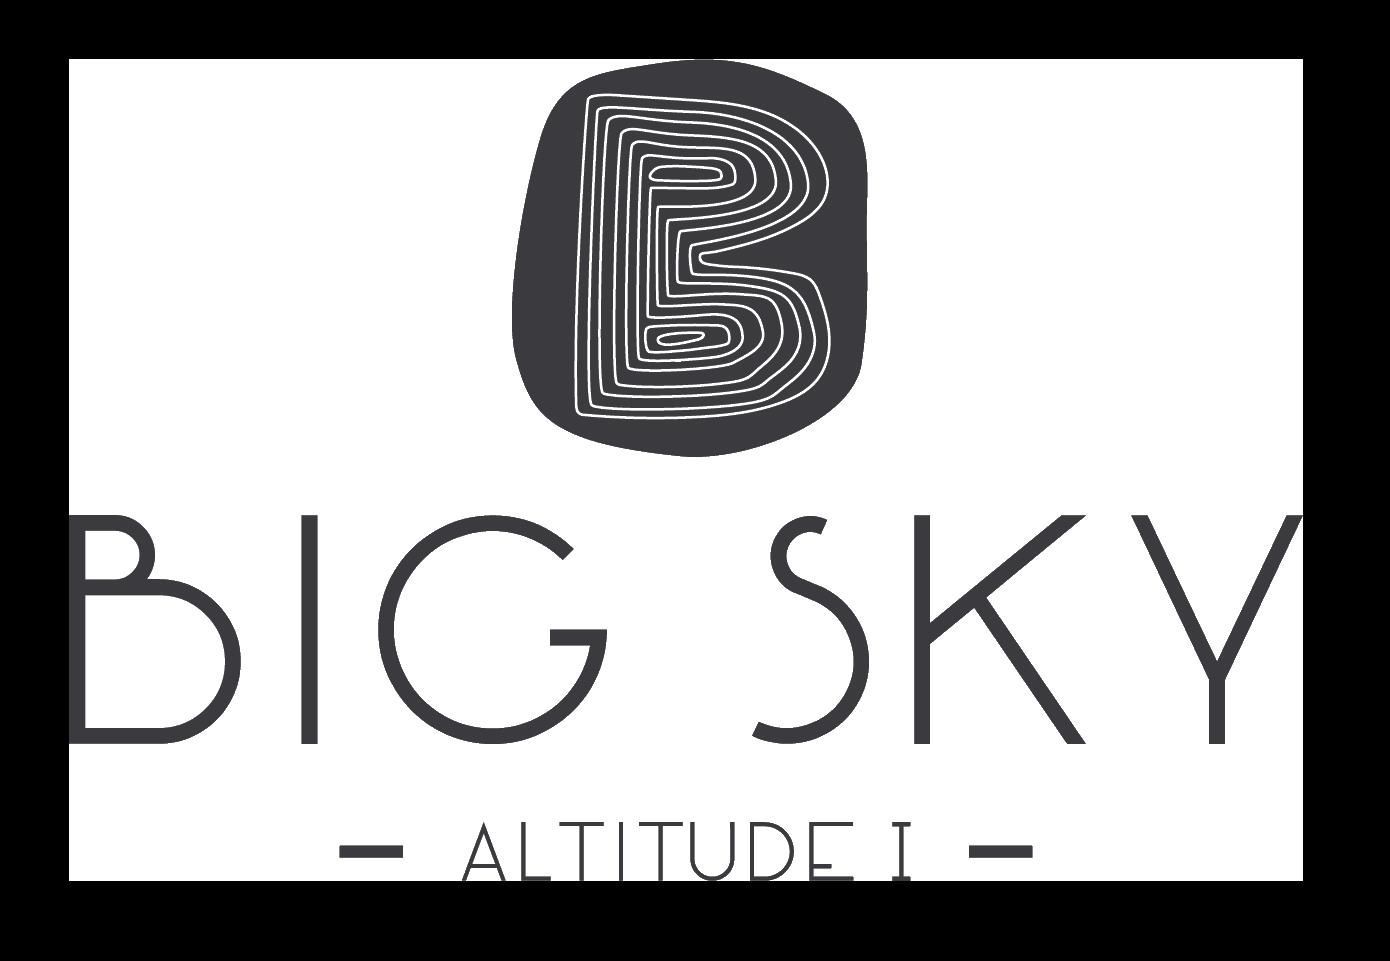 Logo_Altitude I.png